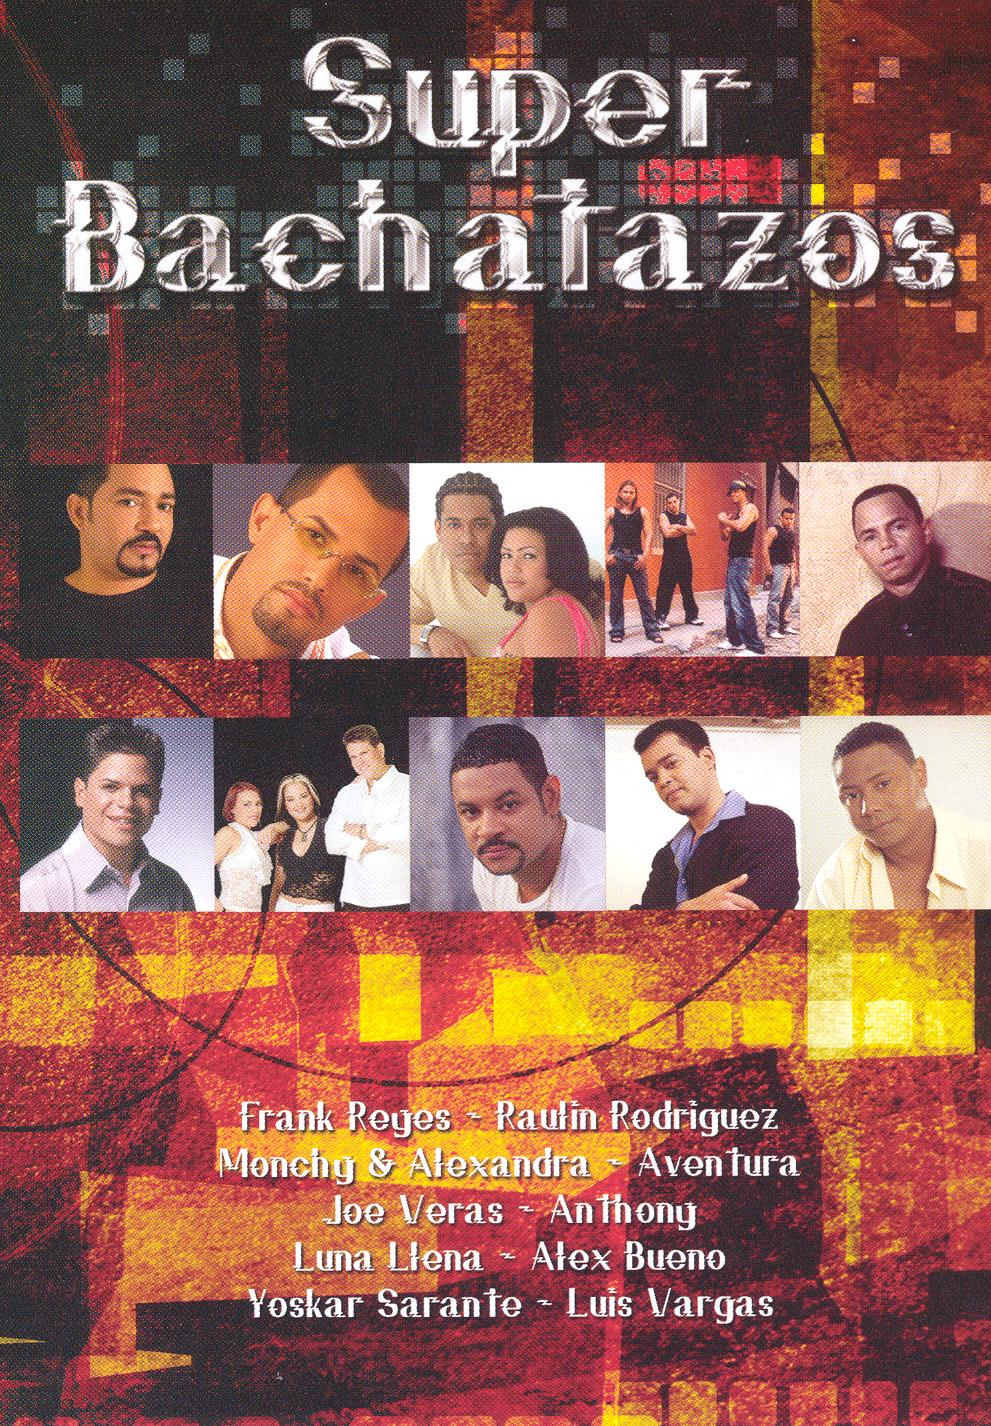 Super Bachatazos 2004